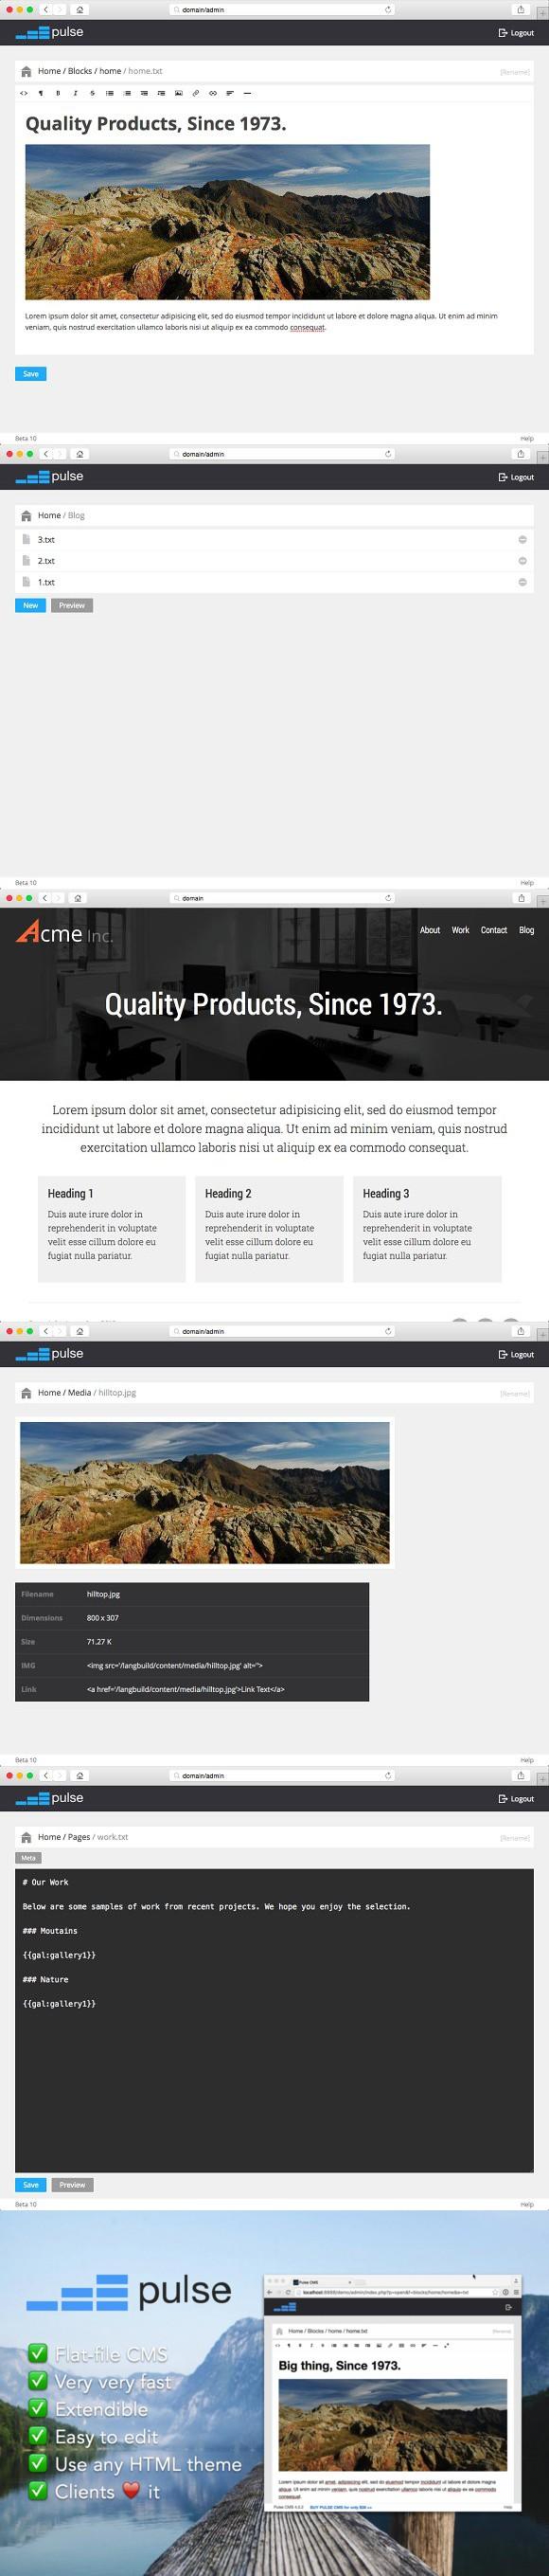 Pulse CMS. HTML/CSS Themes. $39.00 | HTML/CSS Themes | Pinterest